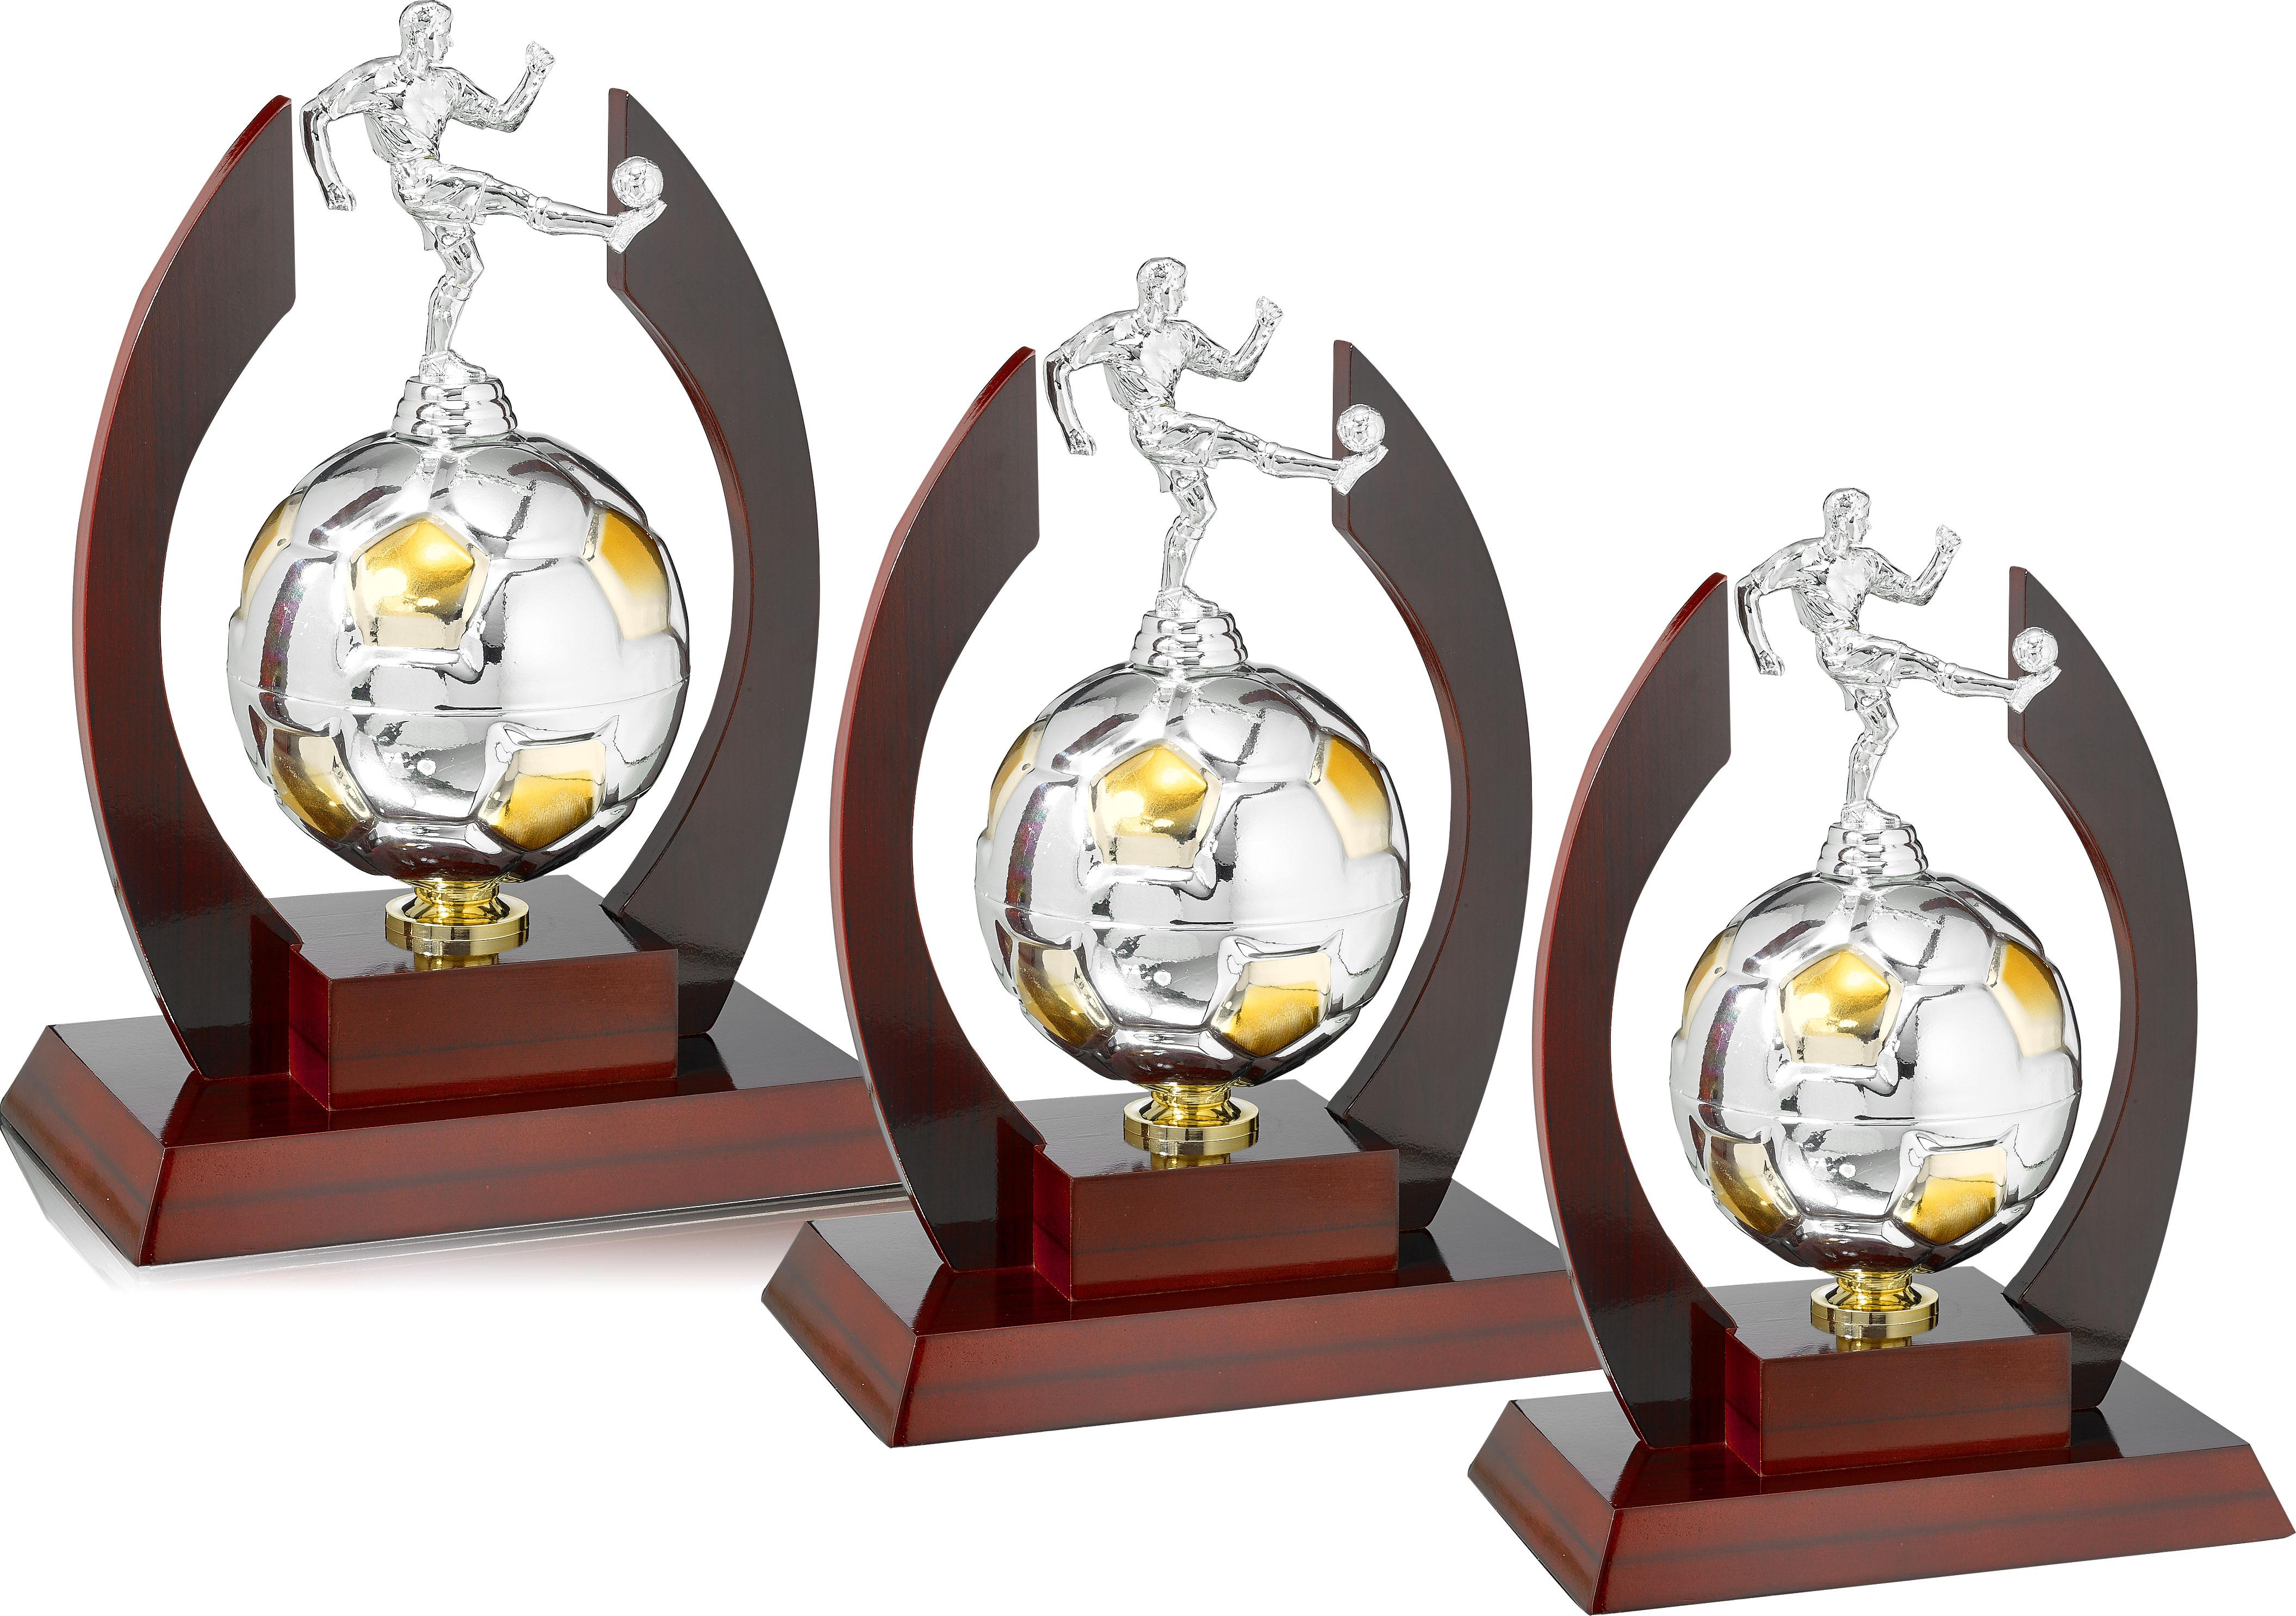 3er Pokalserie: 34-38cm Pokale Pokale ohne Deckel